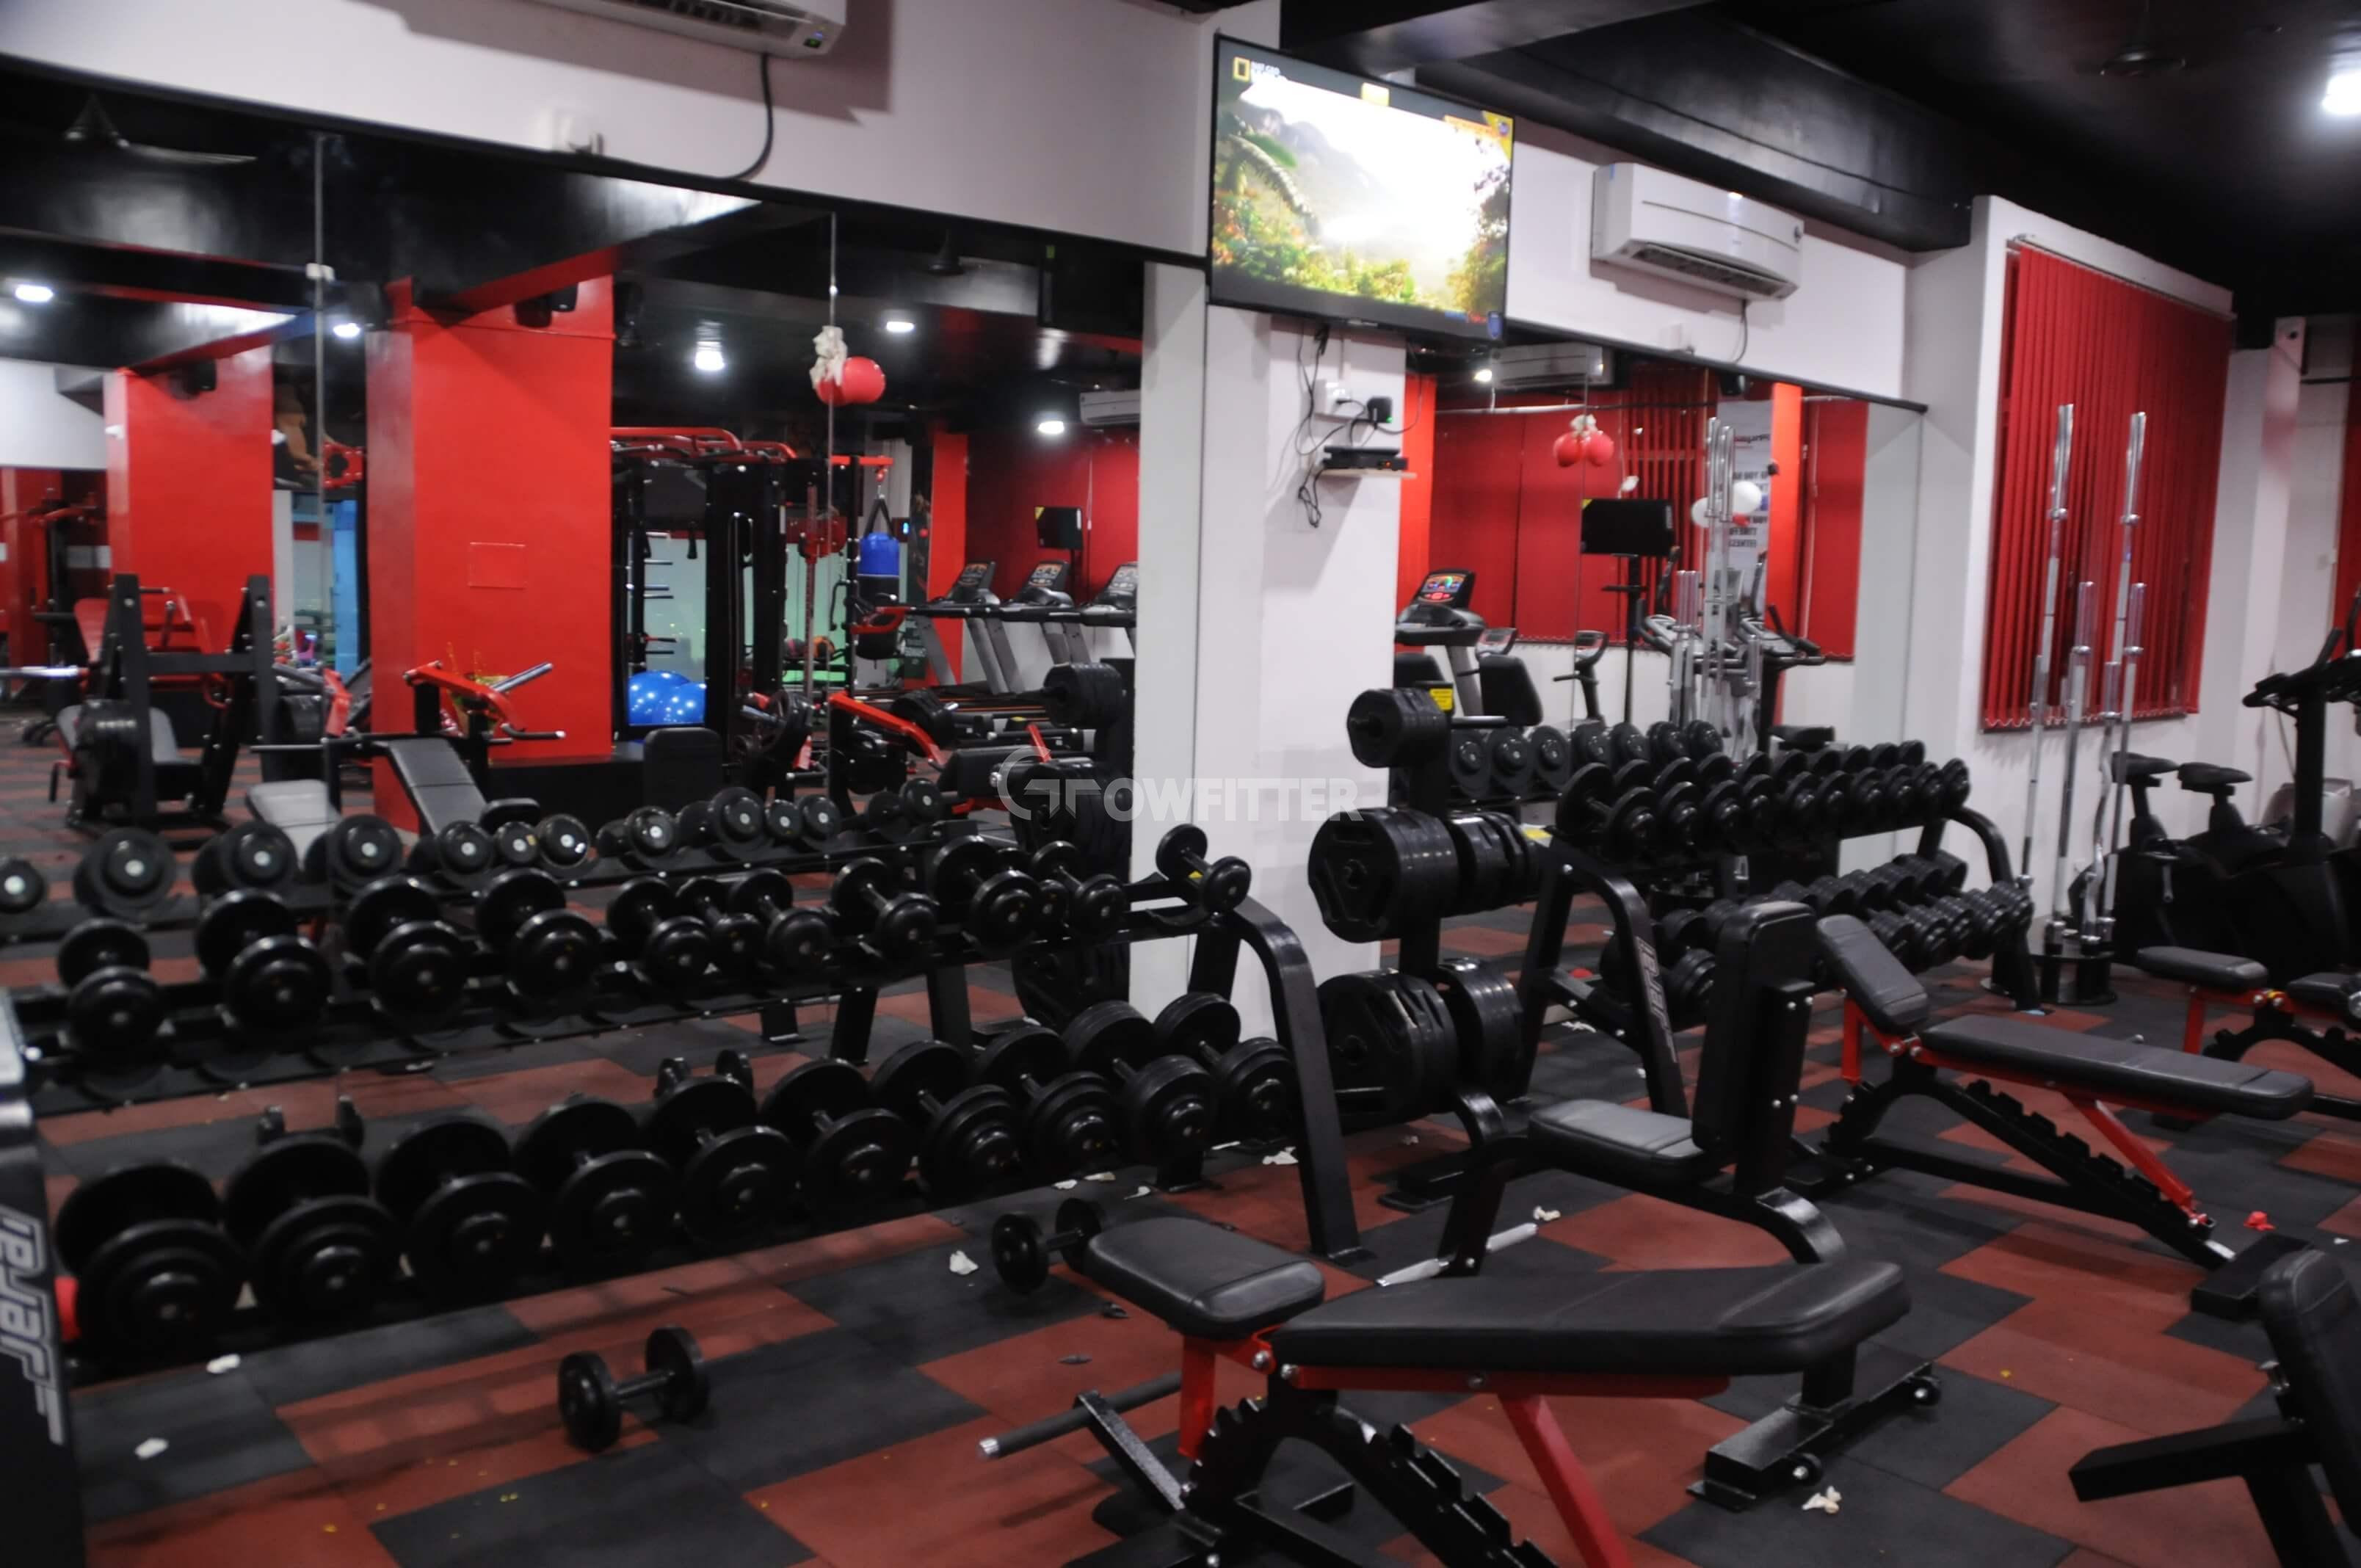 Physc Gym Hadapsar Pune Gym Membership Fees Timings